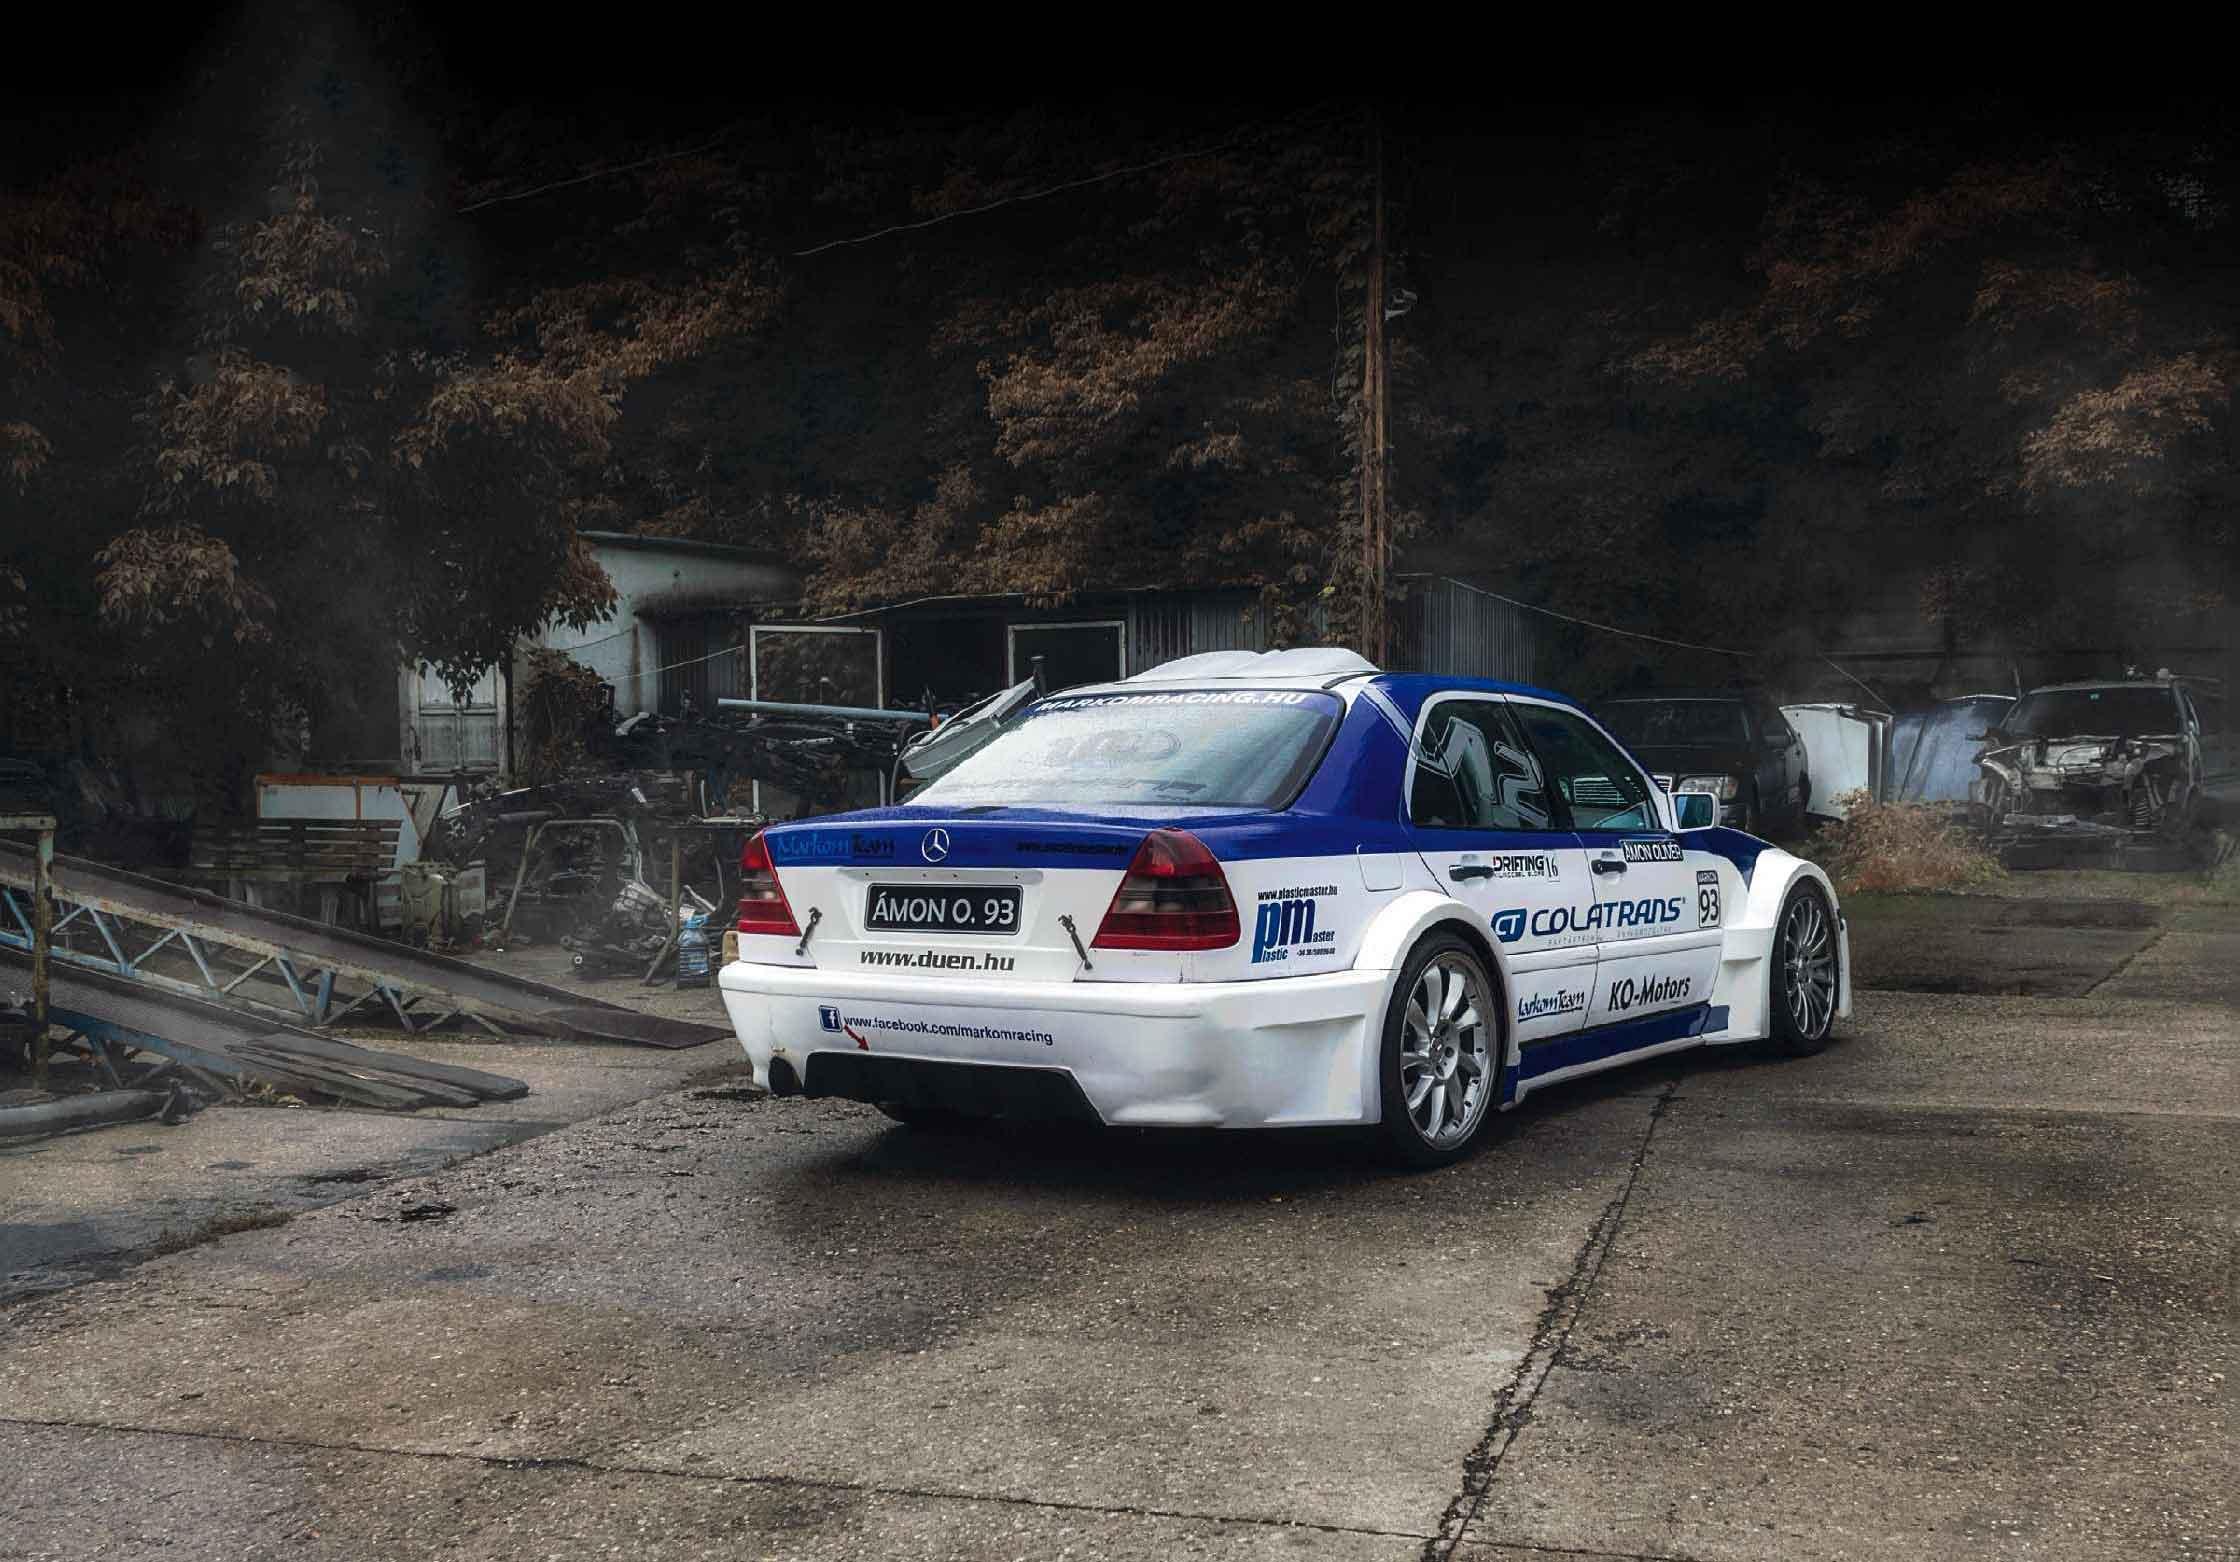 Mercedes-Benz C600 W202 - 6 0-litre M120 V12-engined monster - Drive